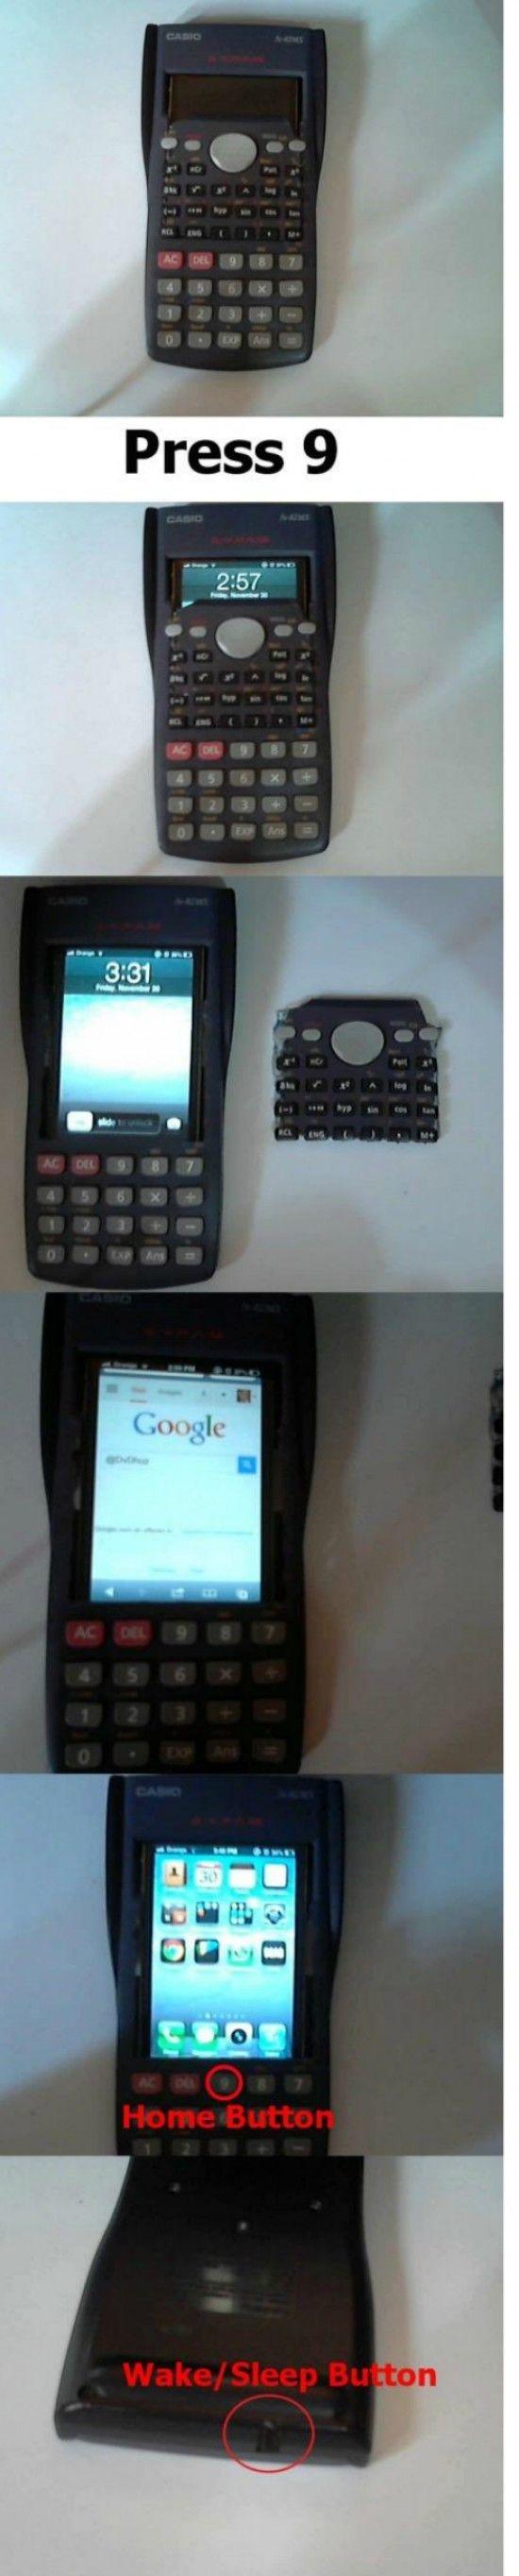 calculadora alterada